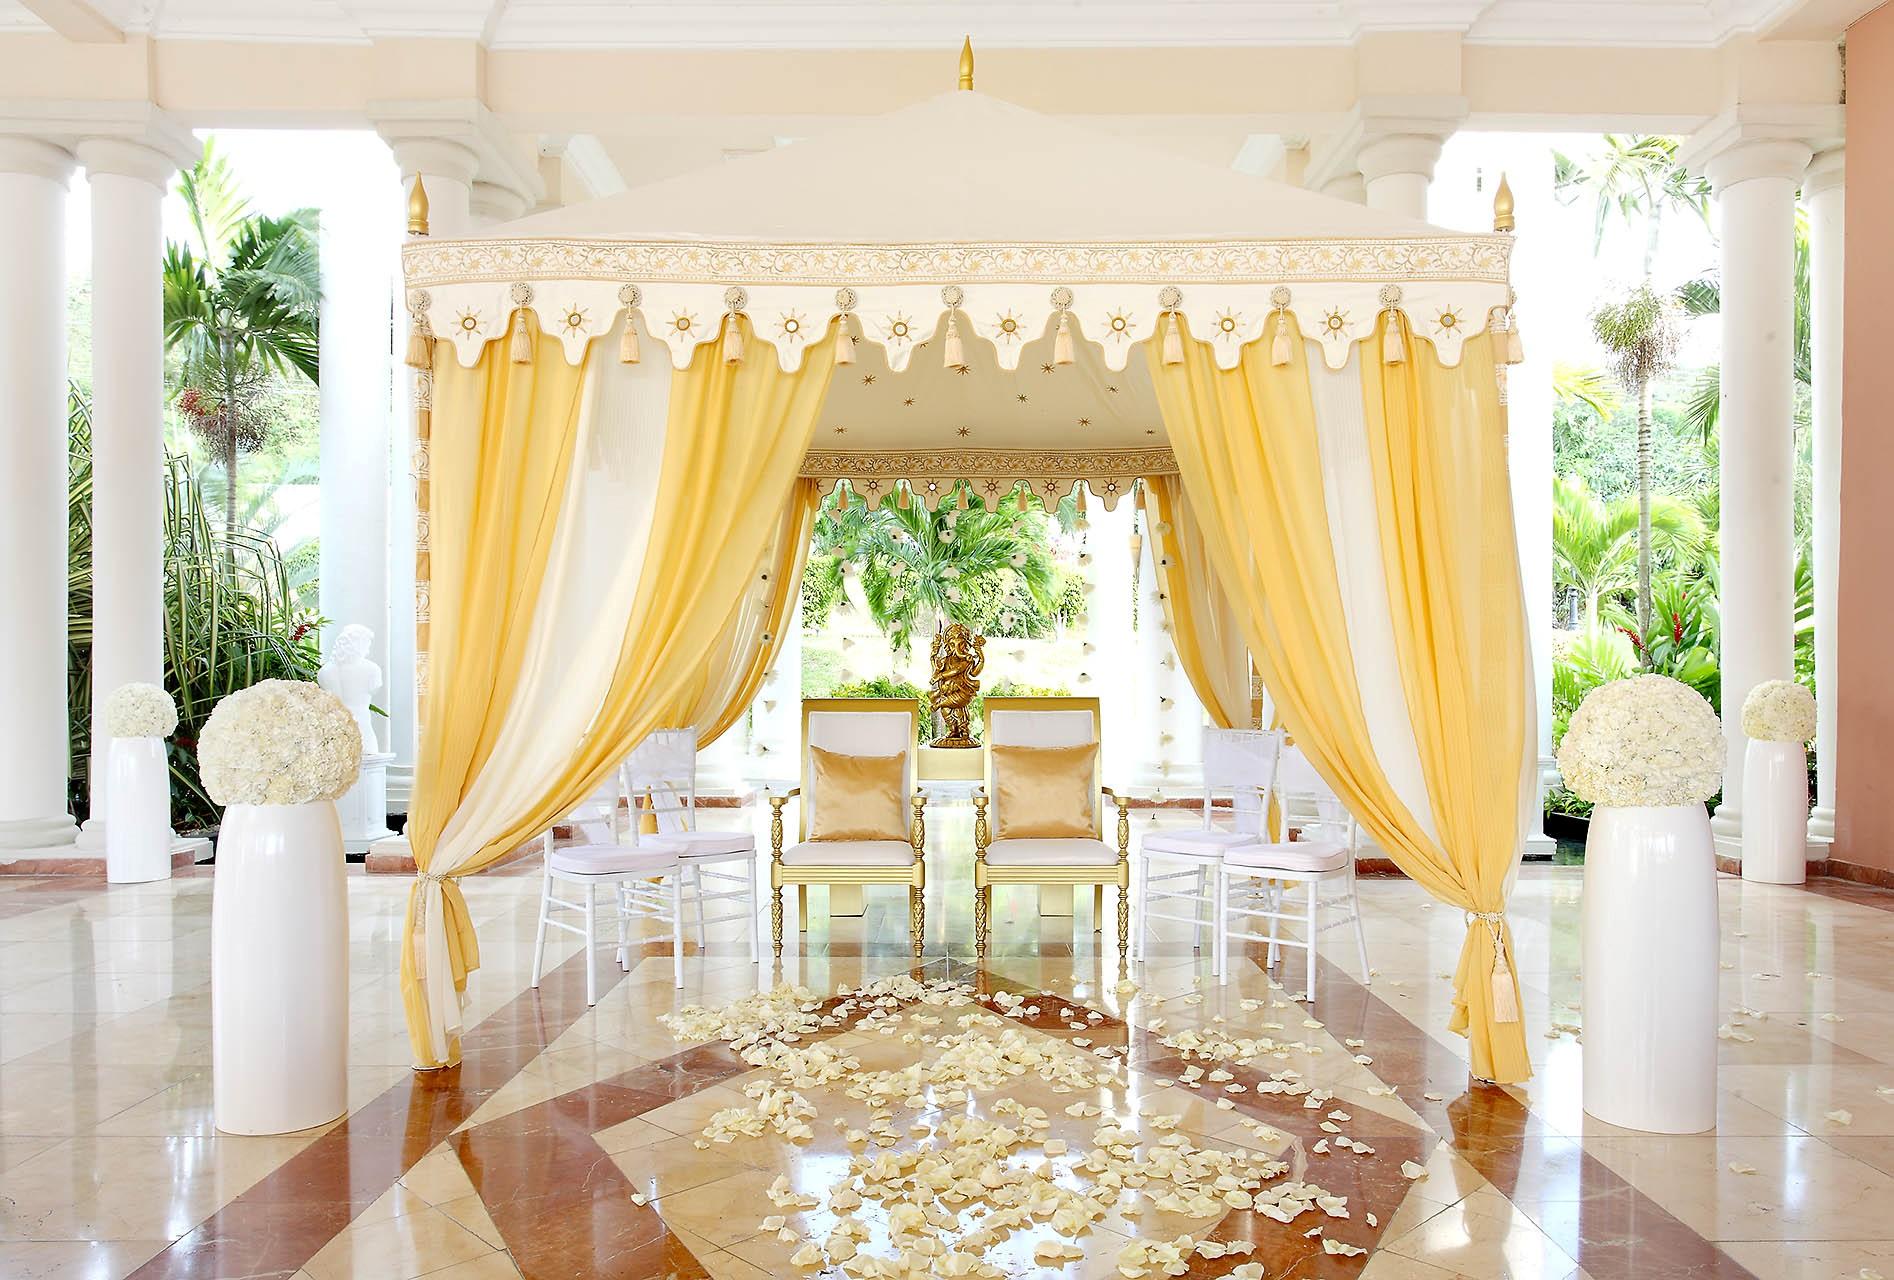 Raj Tents Grand Palladium Karen Bussen Indian Wedding Pergolas 2